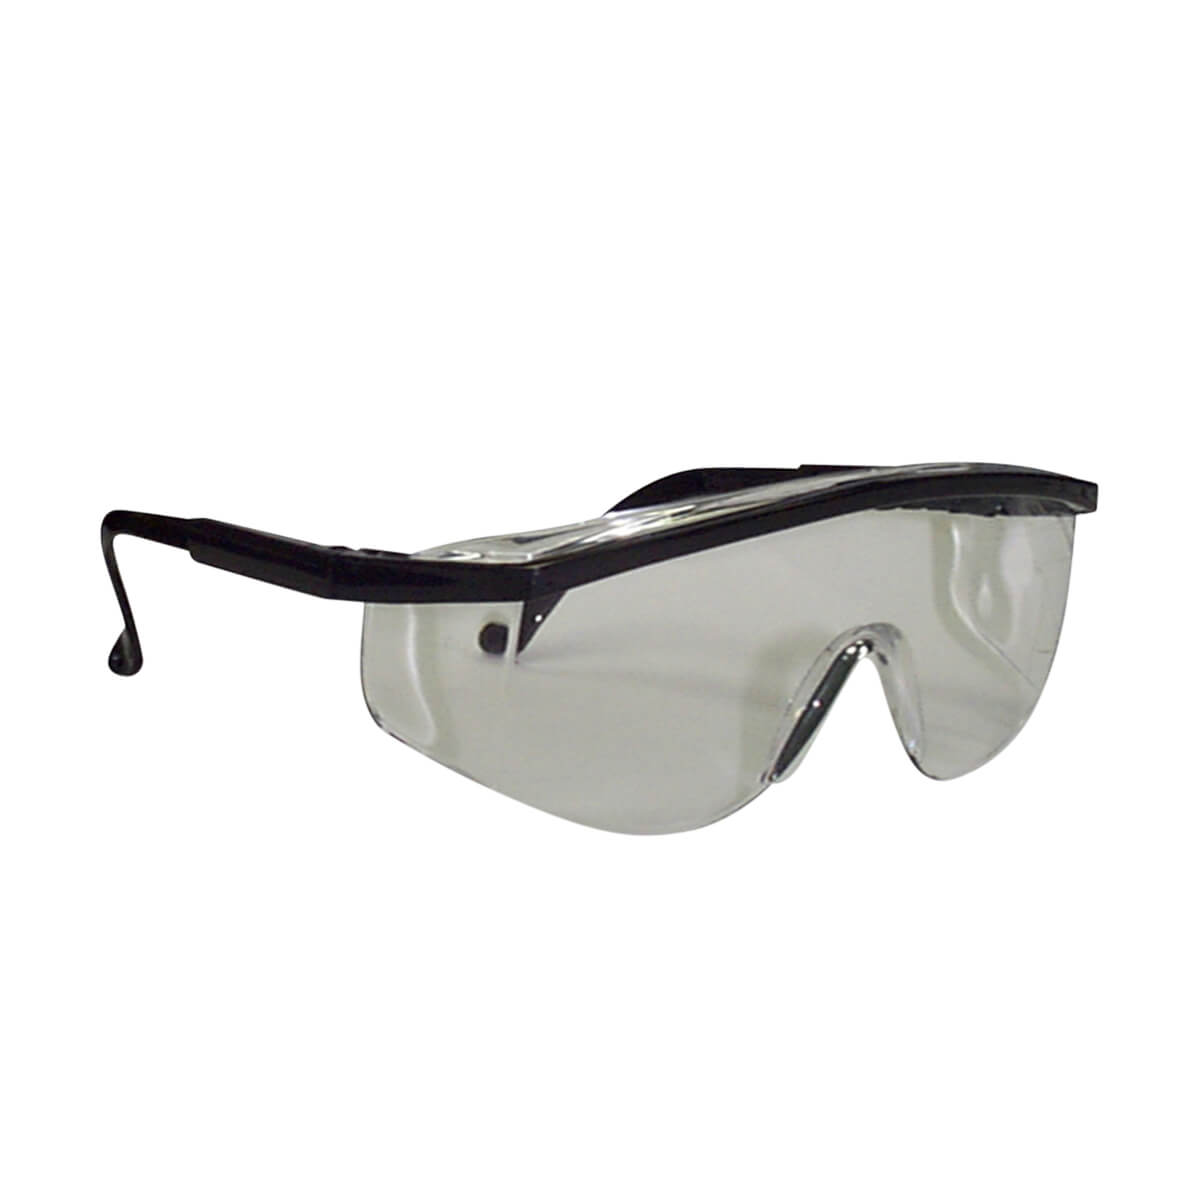 Beretta Protective Eyewear - Clear Lens